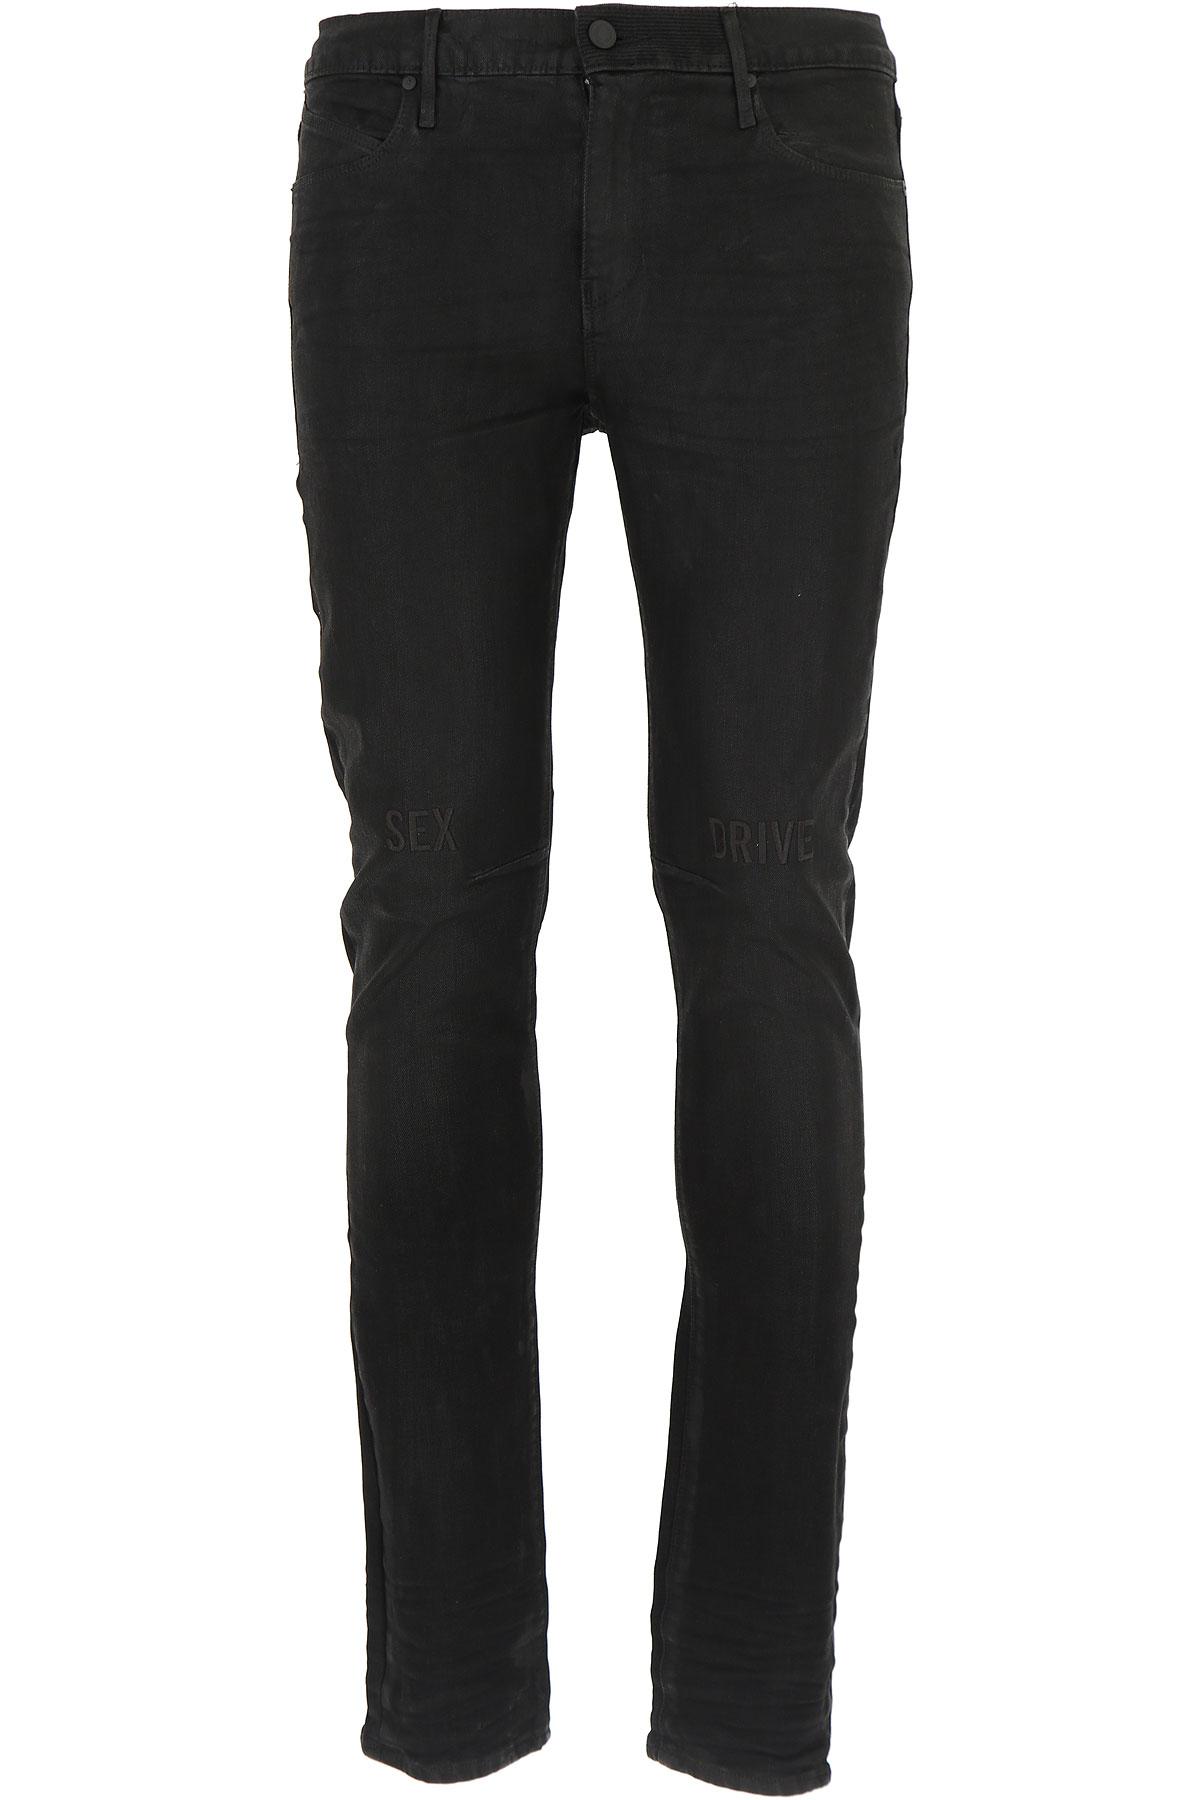 Image of RtA Jeans, Black, Cotton, 2017, US 29 - EU 45 US 30 - EU 46 US 31 - EU 47 US 32 - EU 48 US 33 - EU 49 US 34 - EU 50